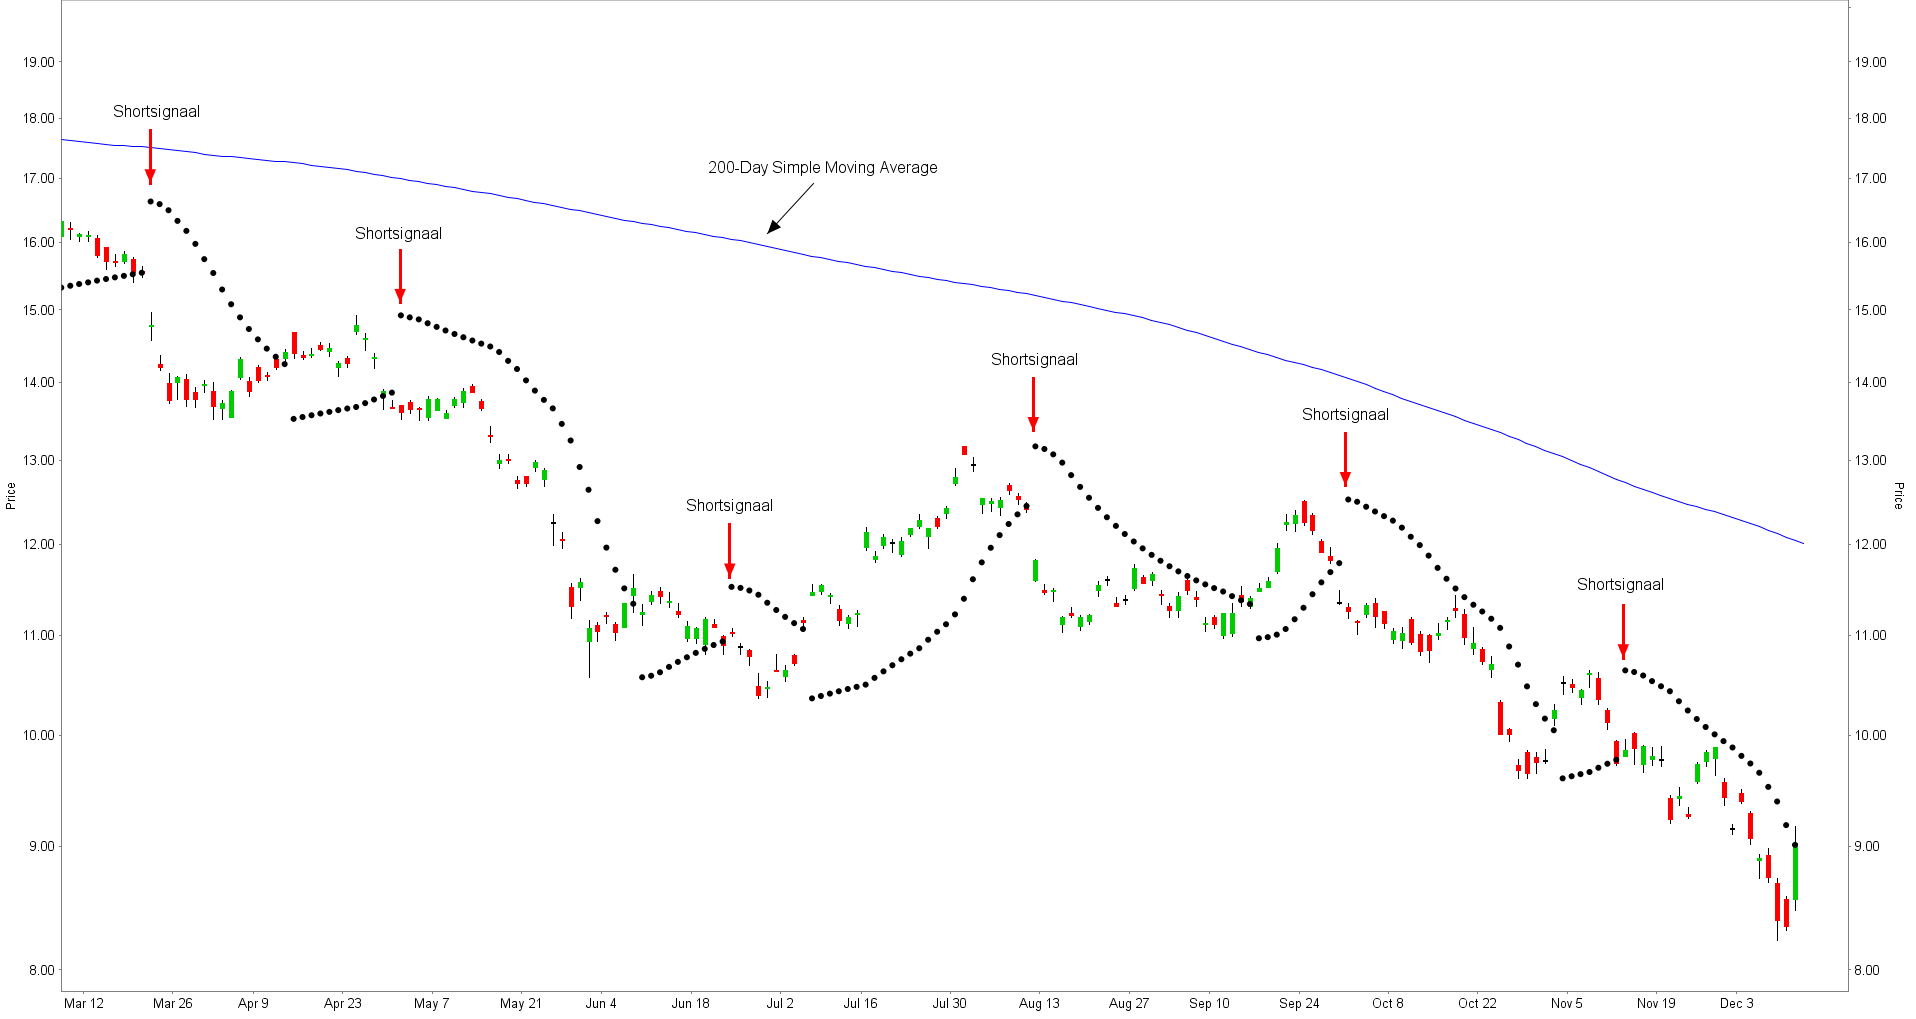 Parabolic SAR en 200 day simple moving average